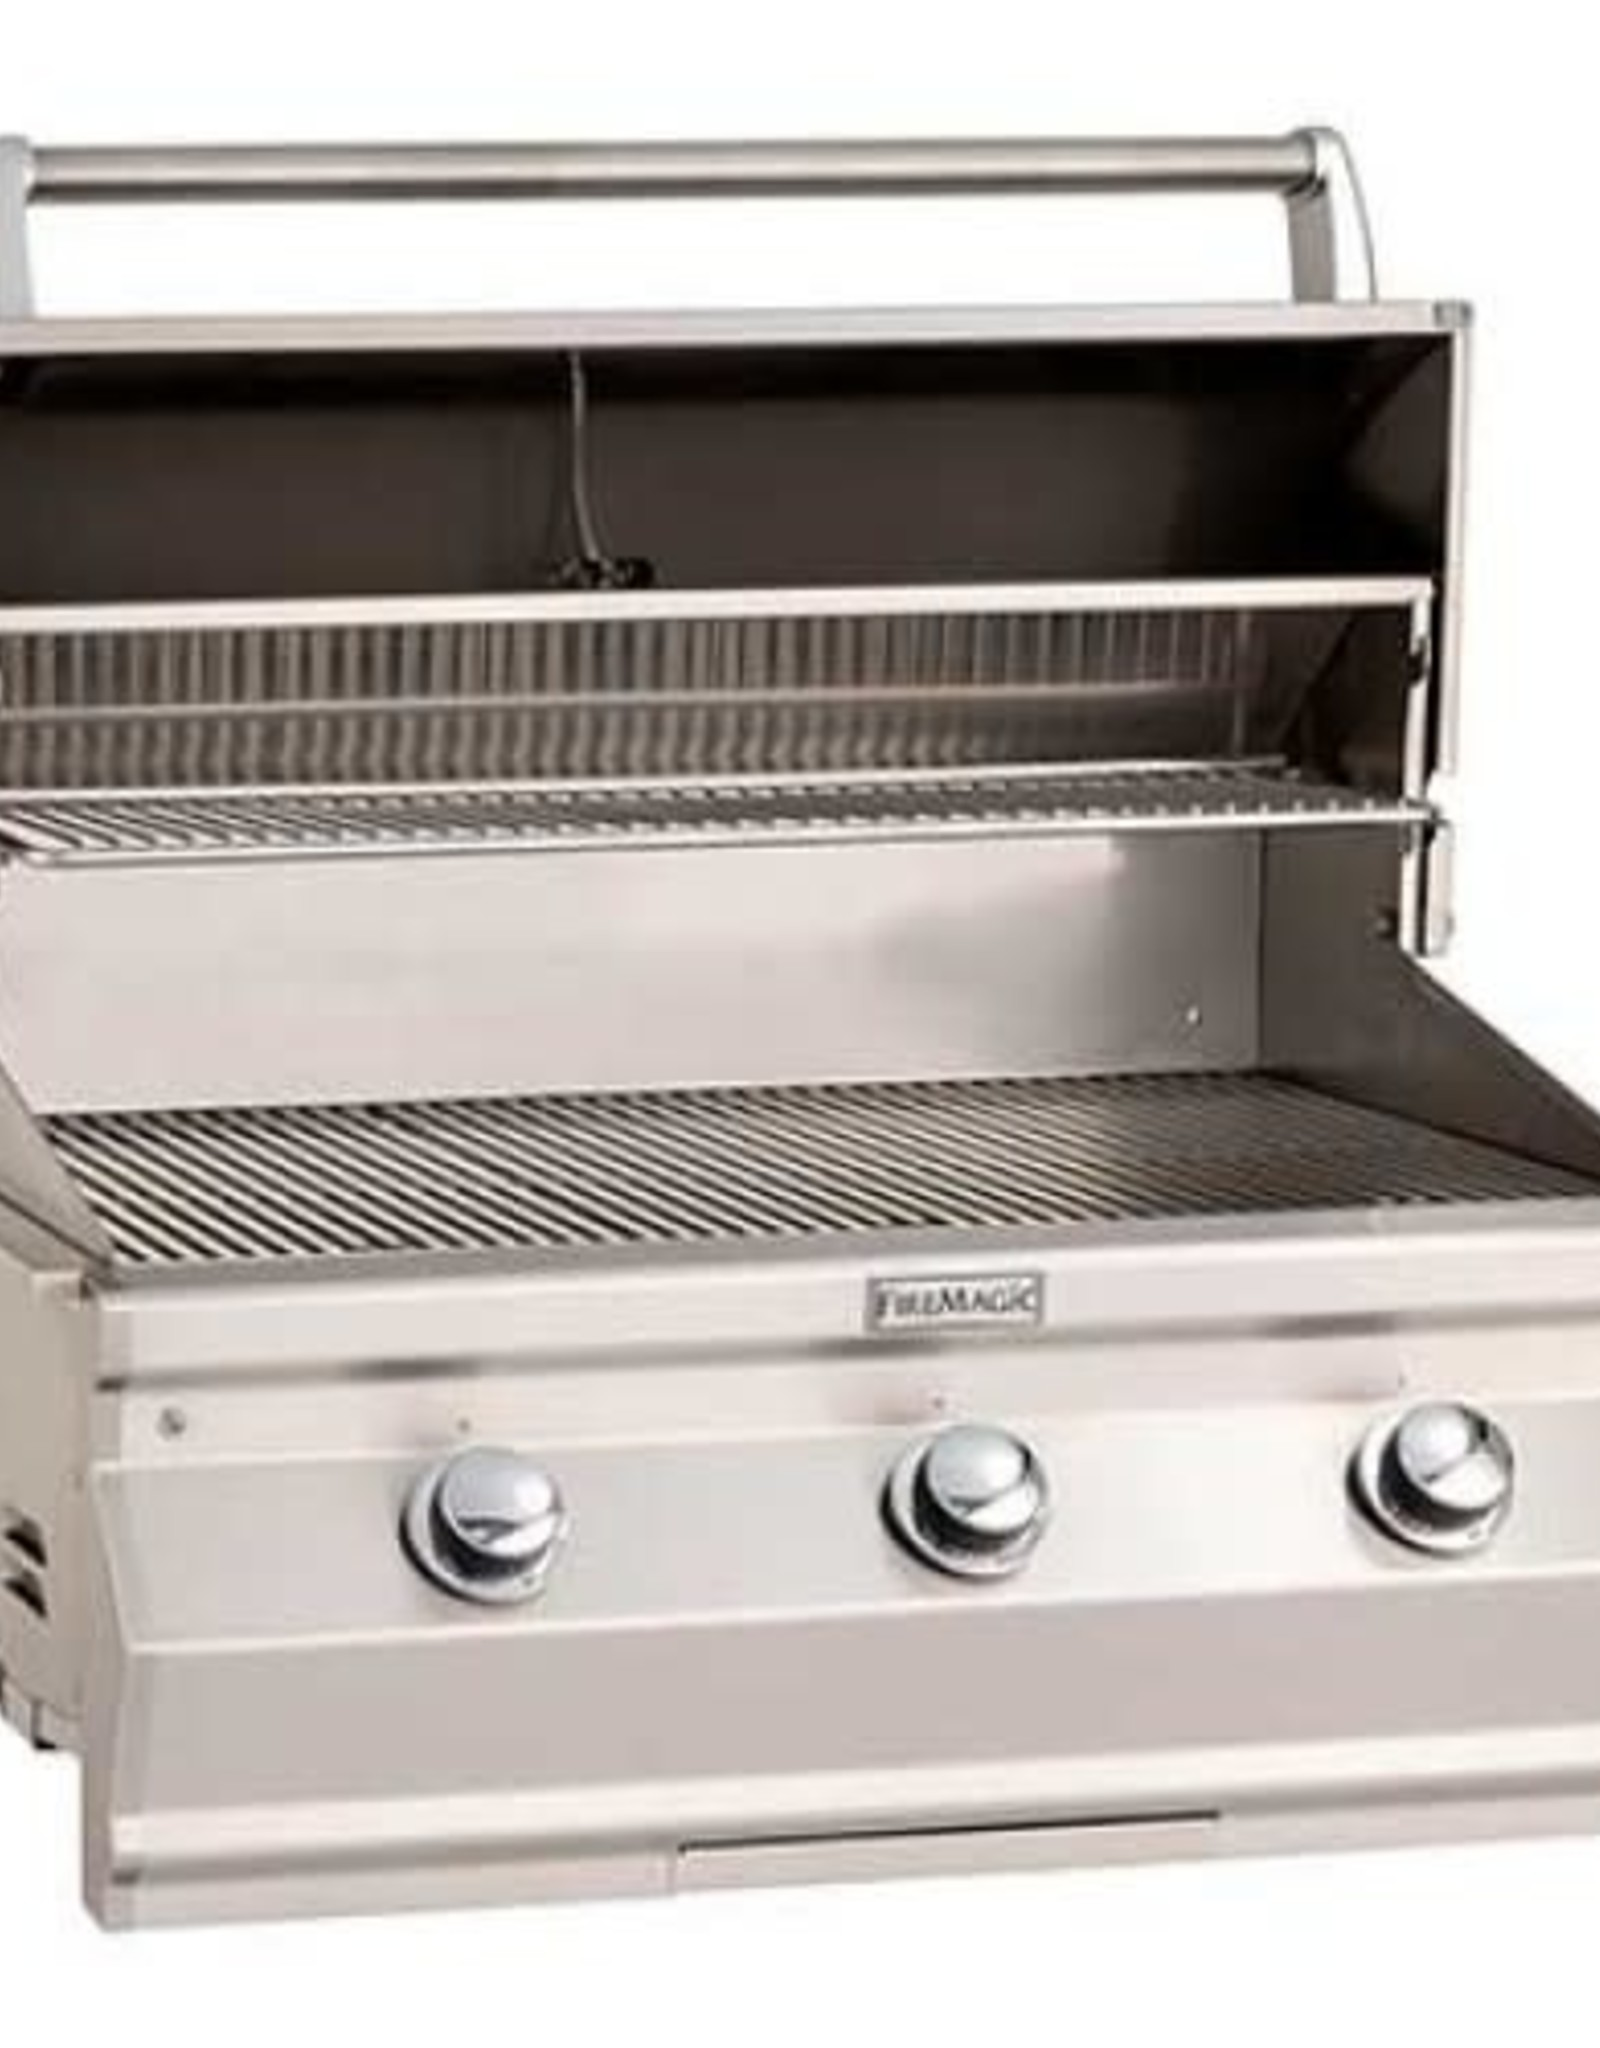 Fire Magic Fire Magic - Choice C540i 30-inch Built-In Grill